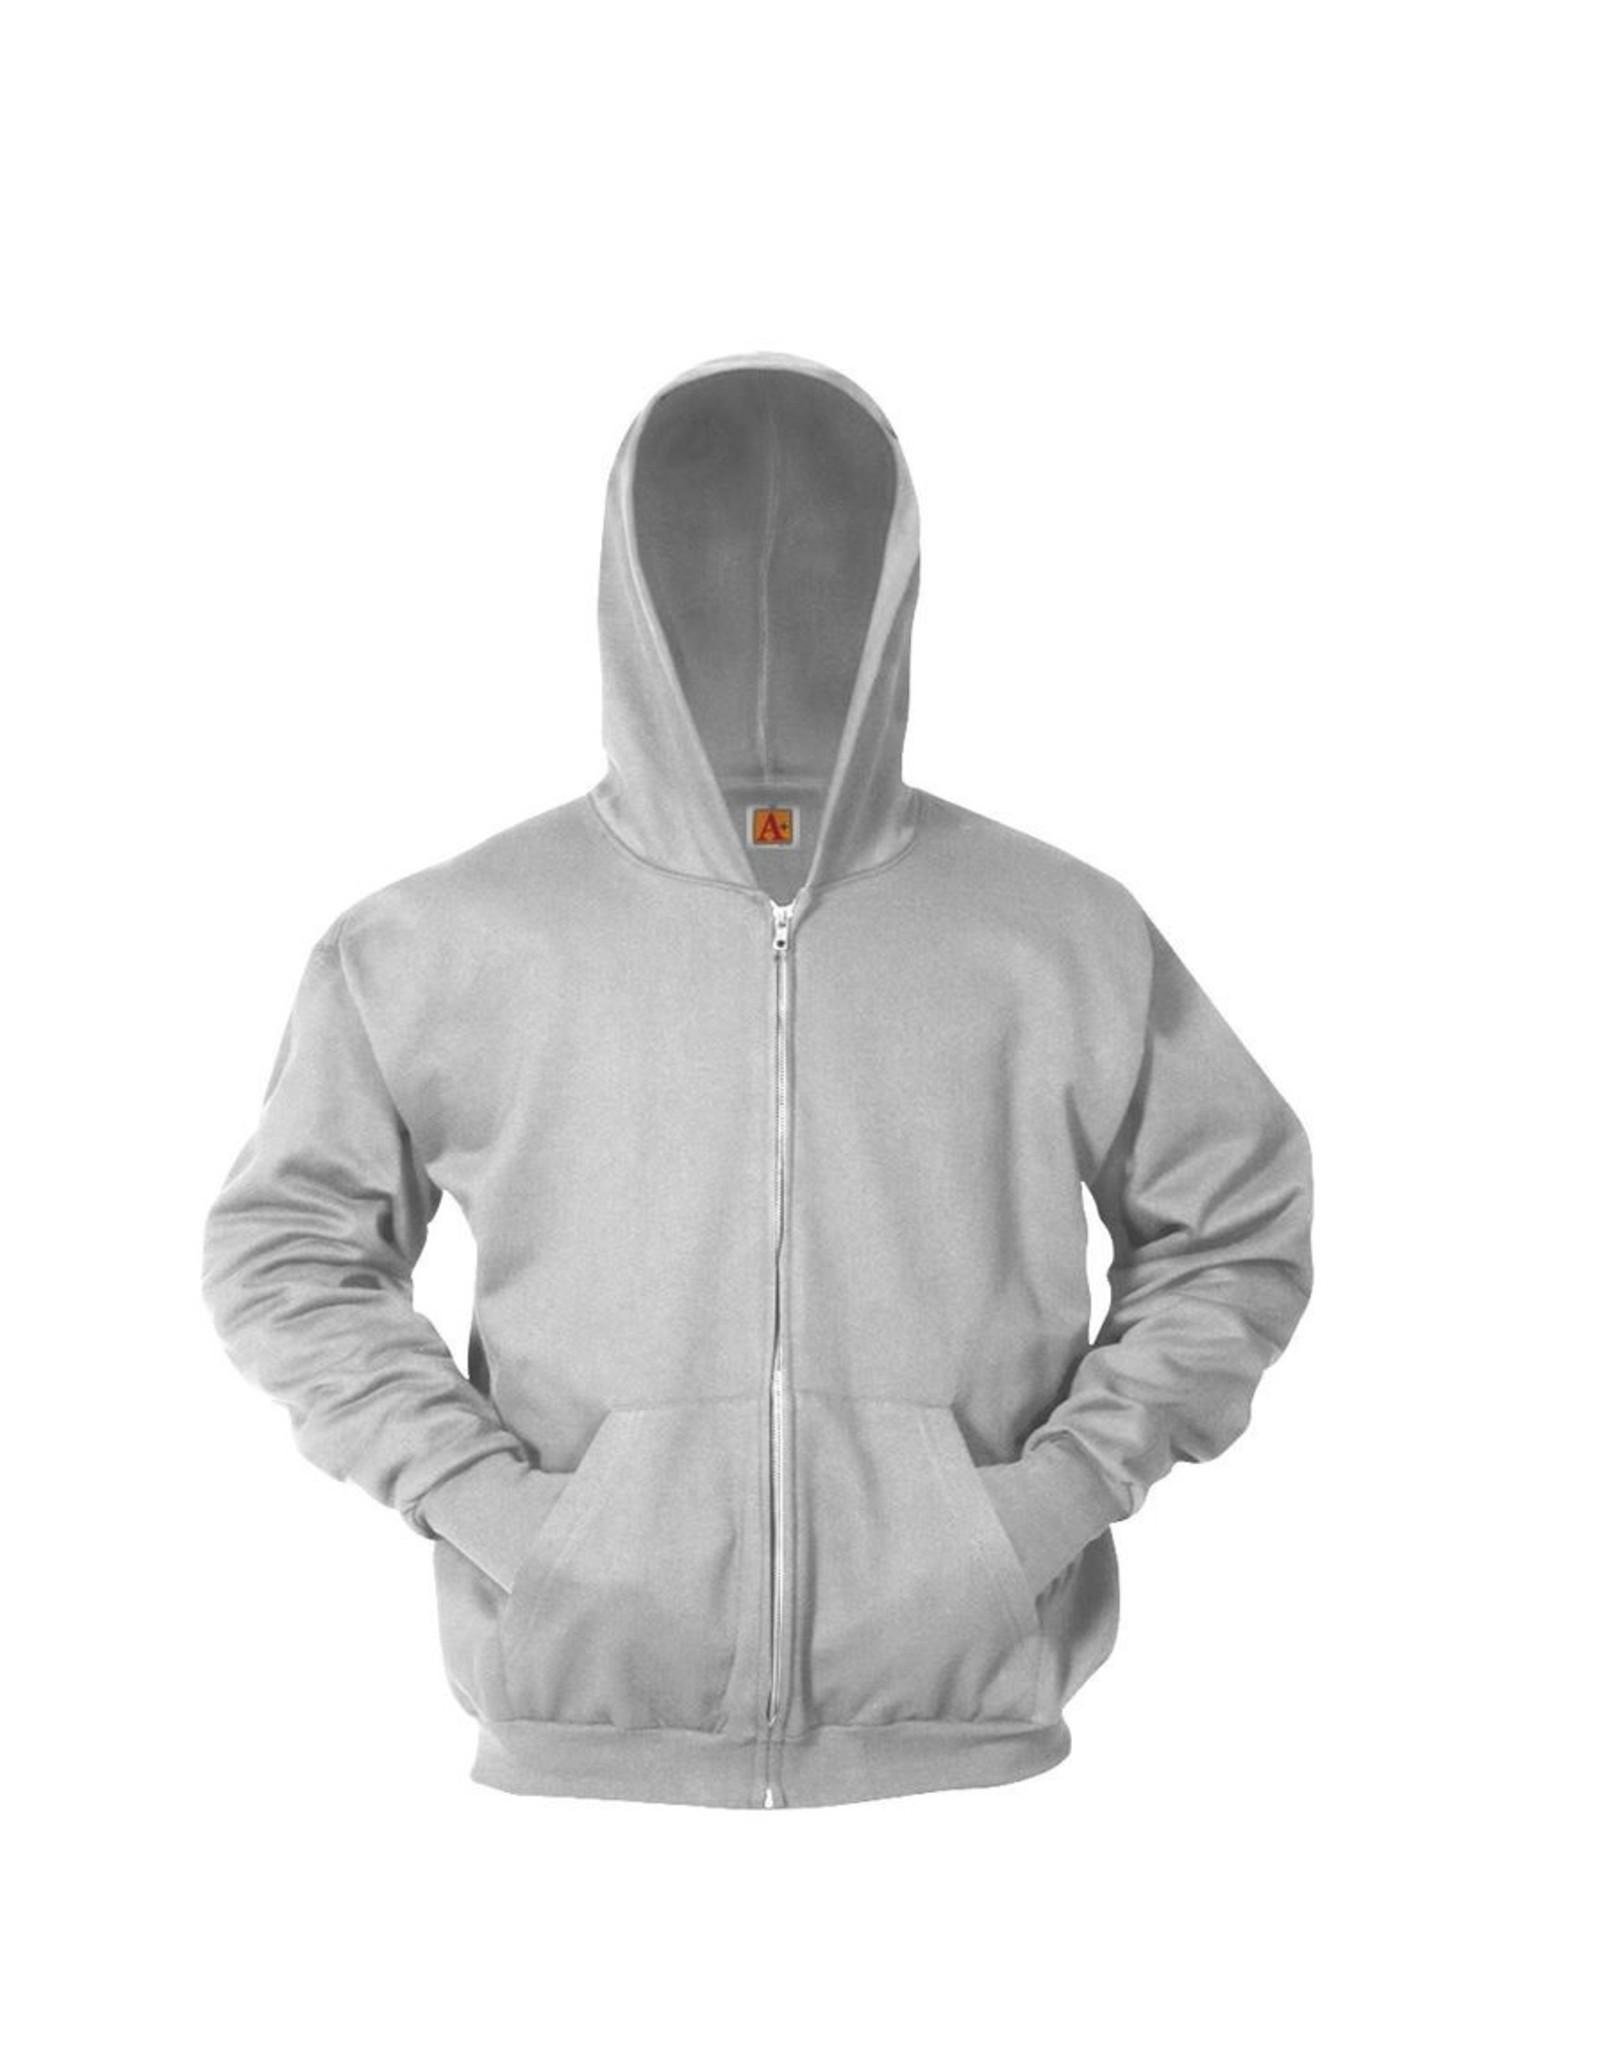 NON-UNIFORM Sweatshirt - Full Zip Hood - youth & adult